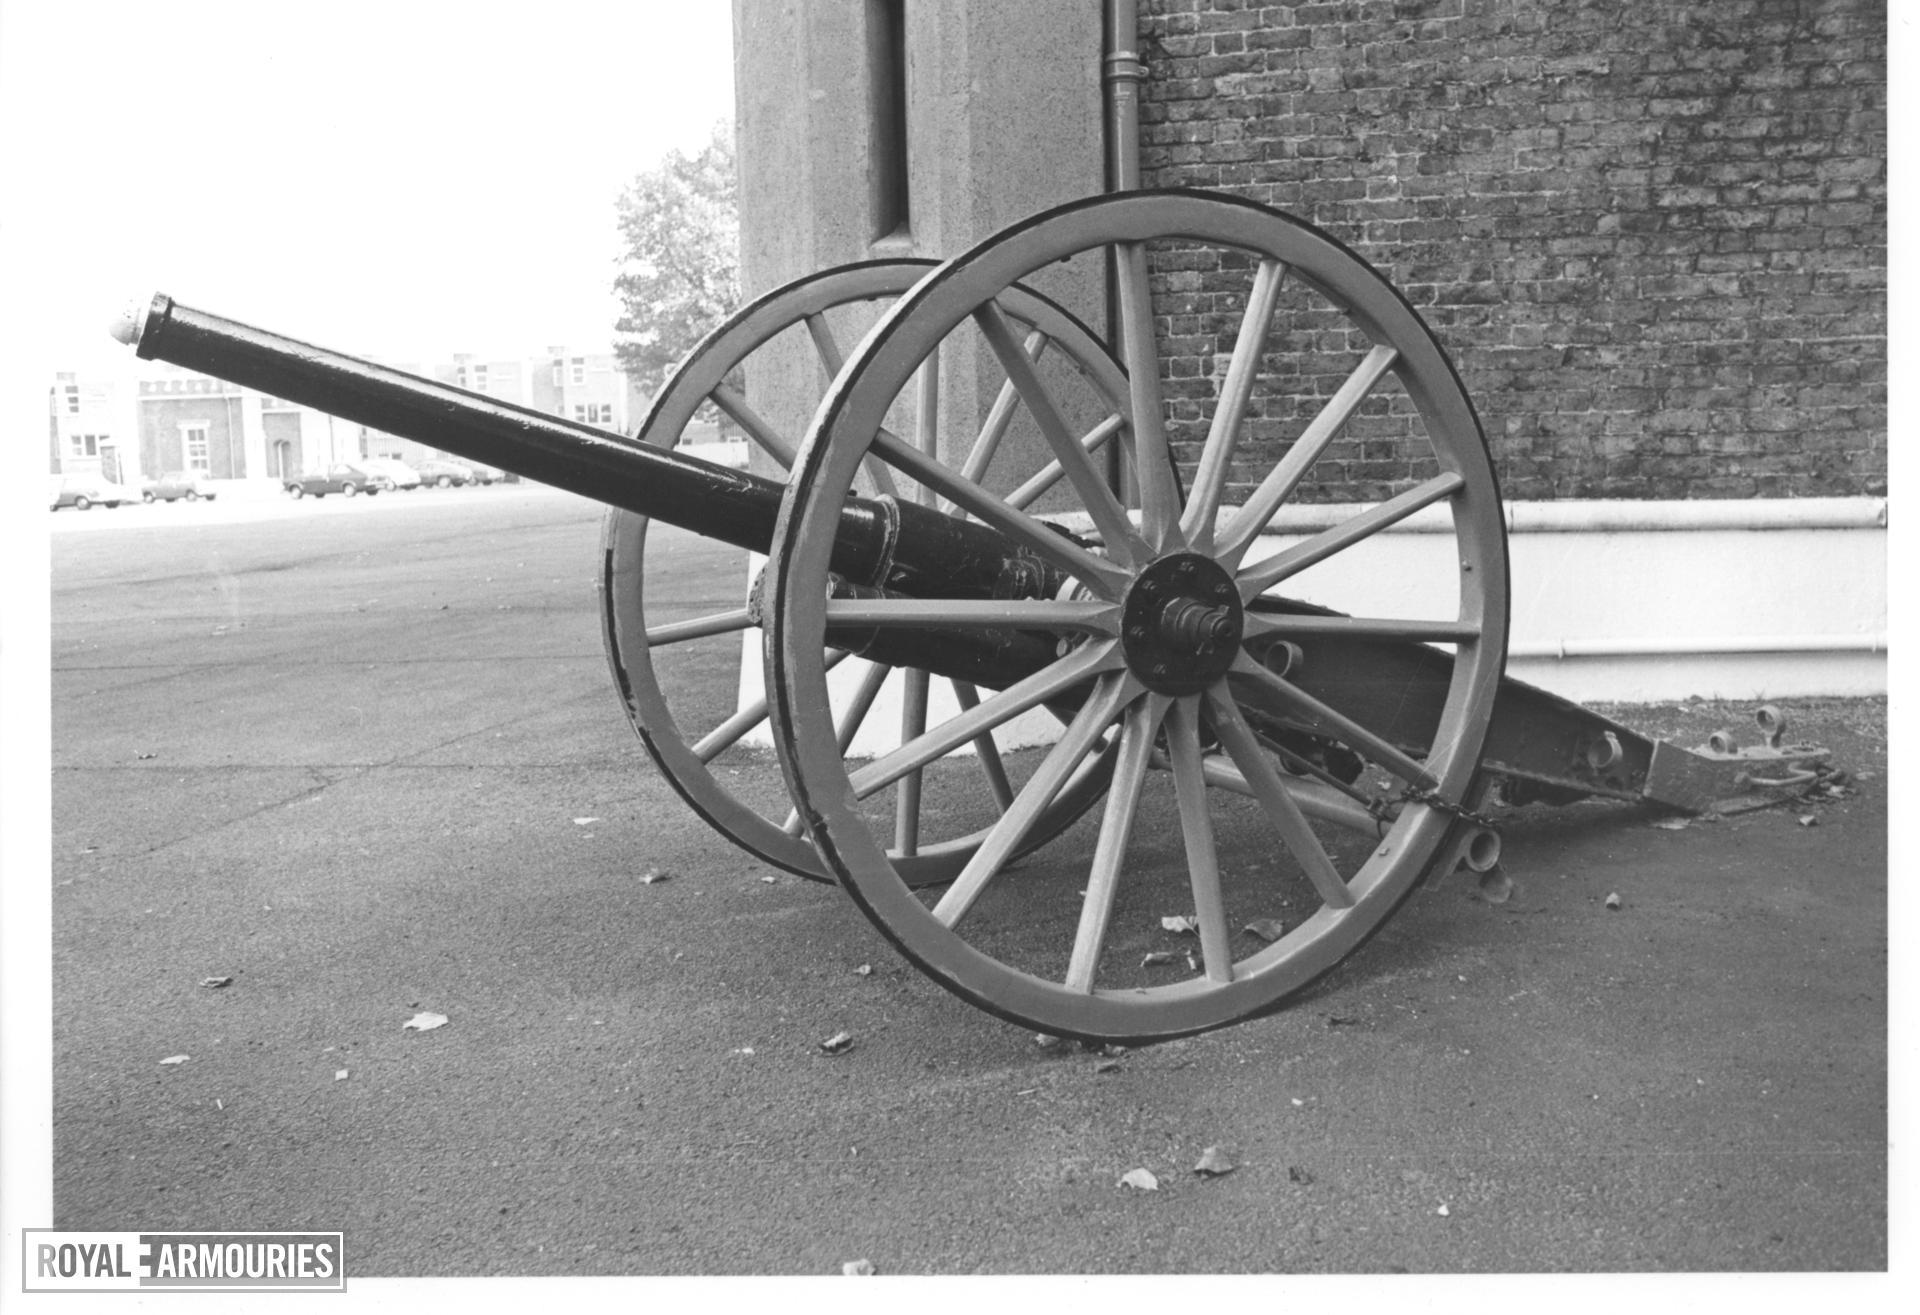 Field Gun - 75 mm QF Model 1897 Schnieder field gun and carriage